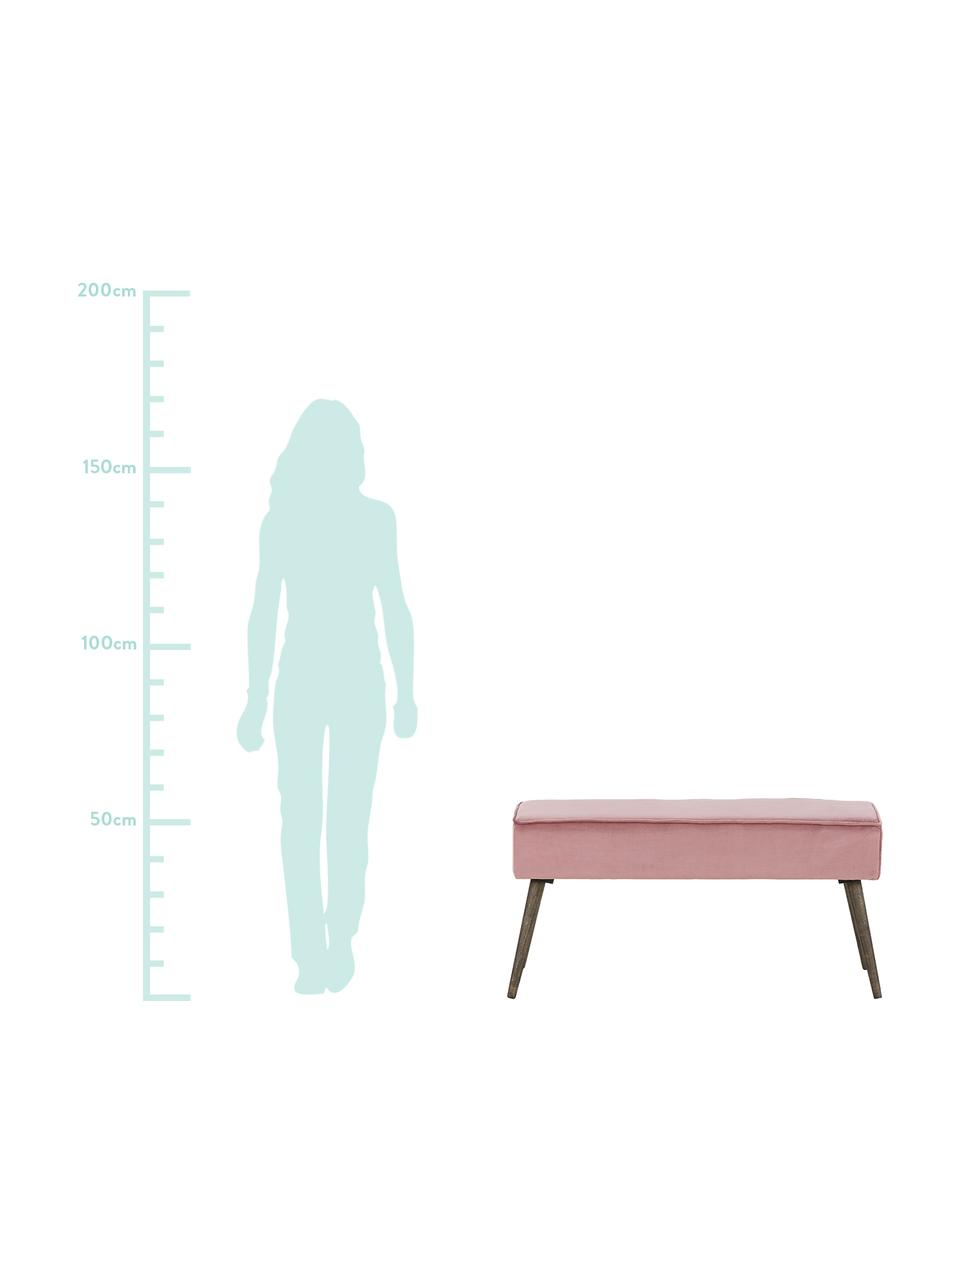 Samt-Polsterbank Popy, Bezug: Polyestersamt 50.000 Sche, Beine: Gummibaumholz, klar lacki, Pink, 100 x 50 cm